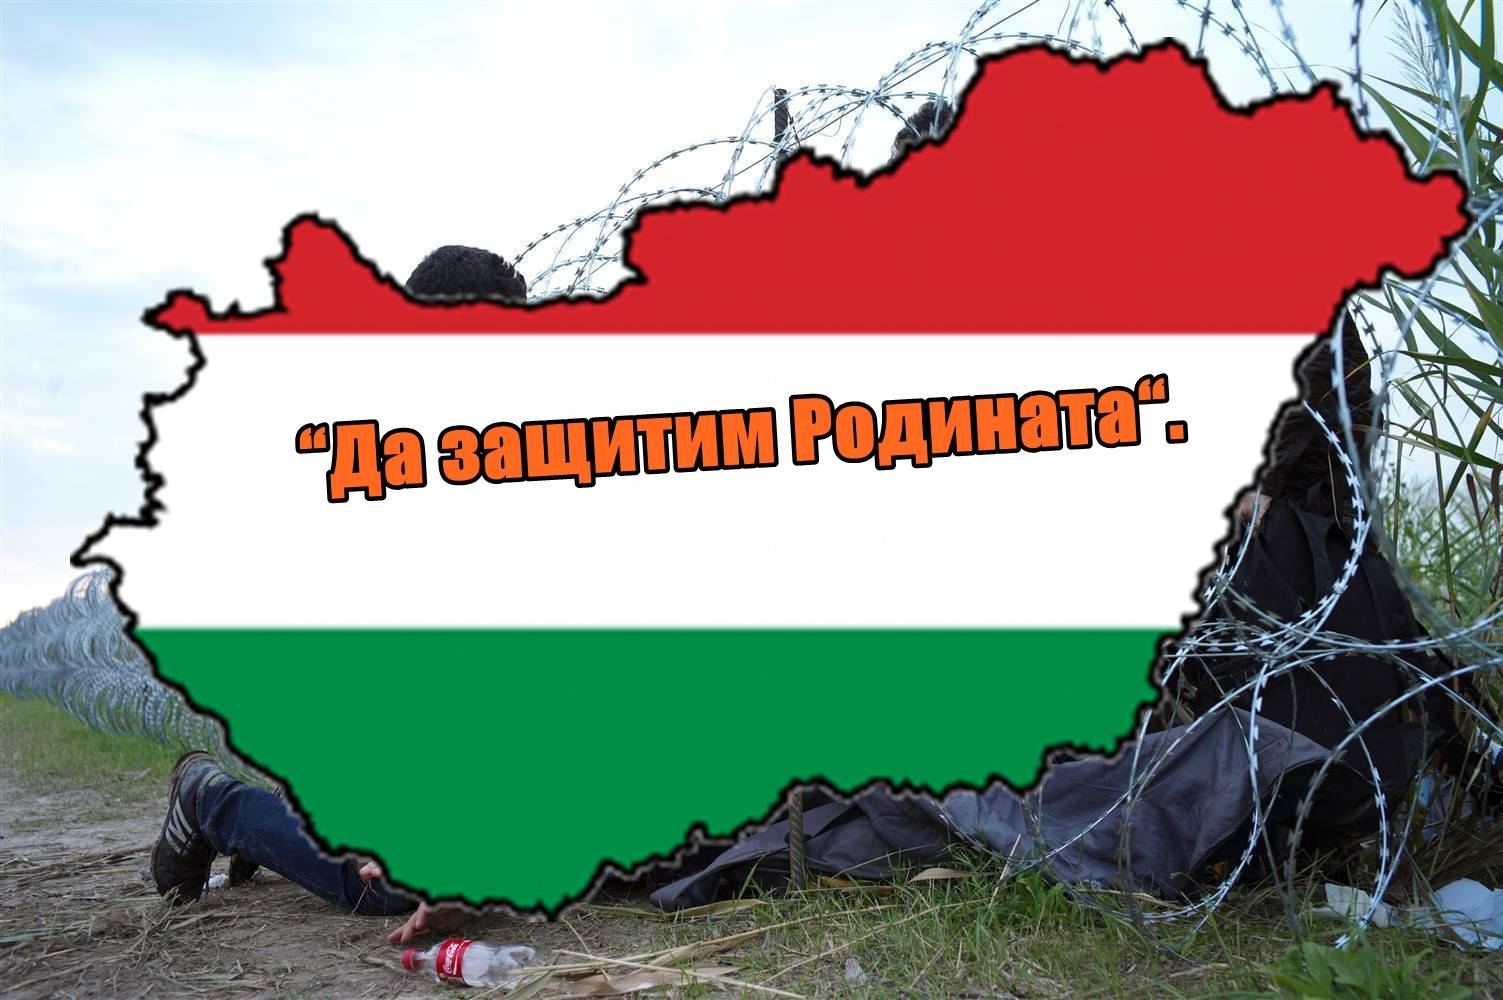 Унгария каза да защитим Родината